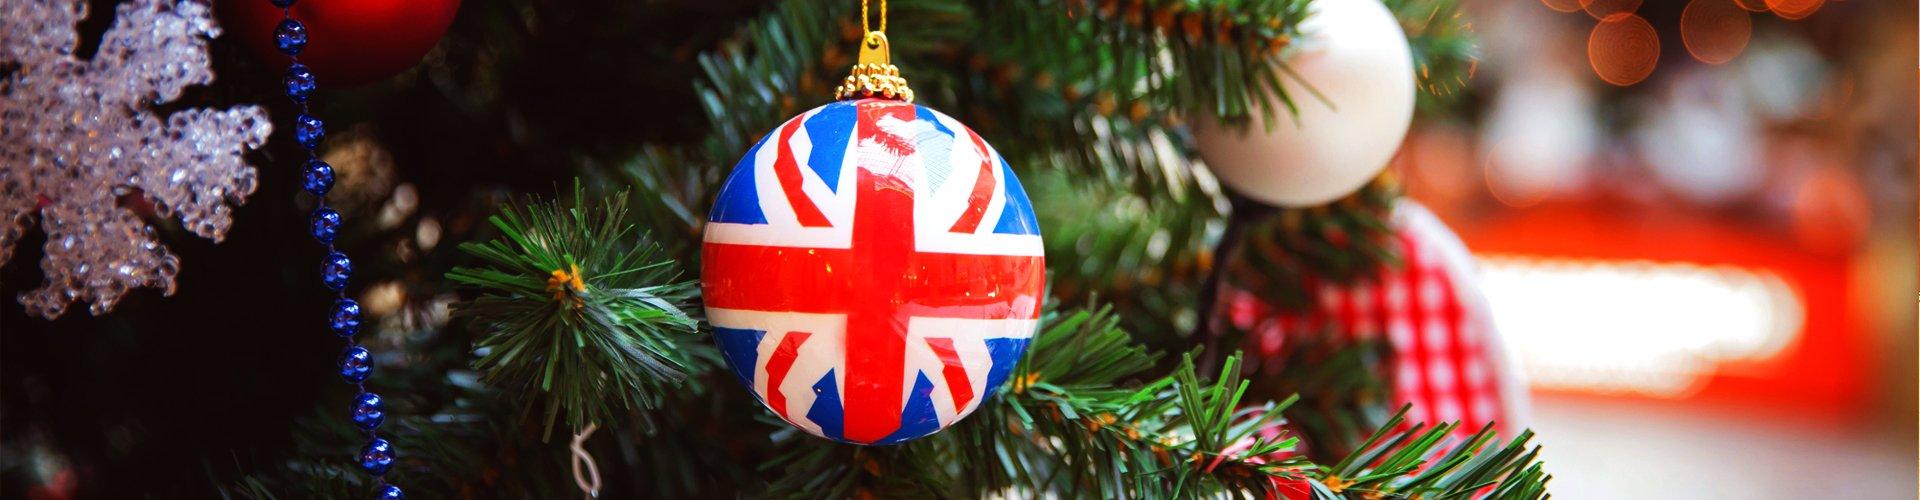 Kerst in Groot-Brittannië